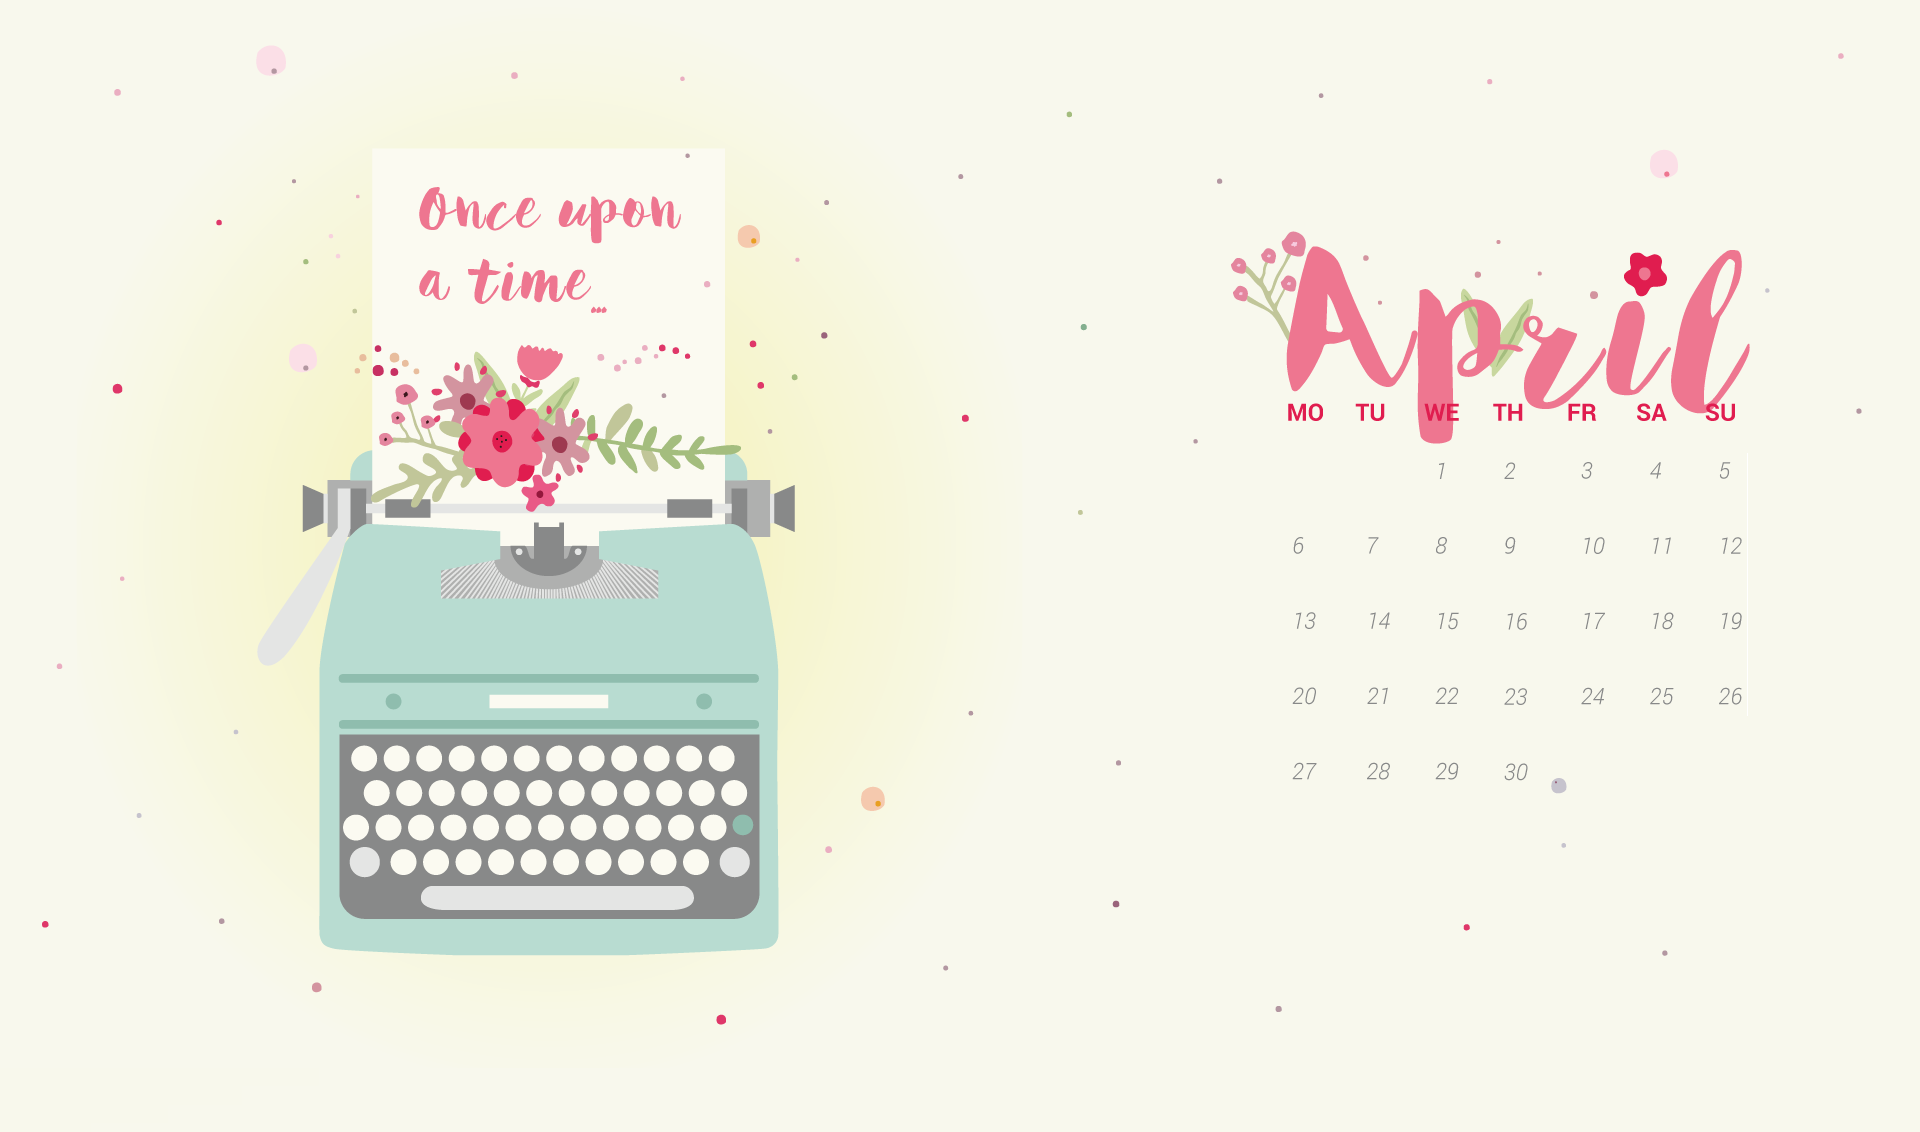 April 2020 Desktop Wallpapers Wallpaper Cave